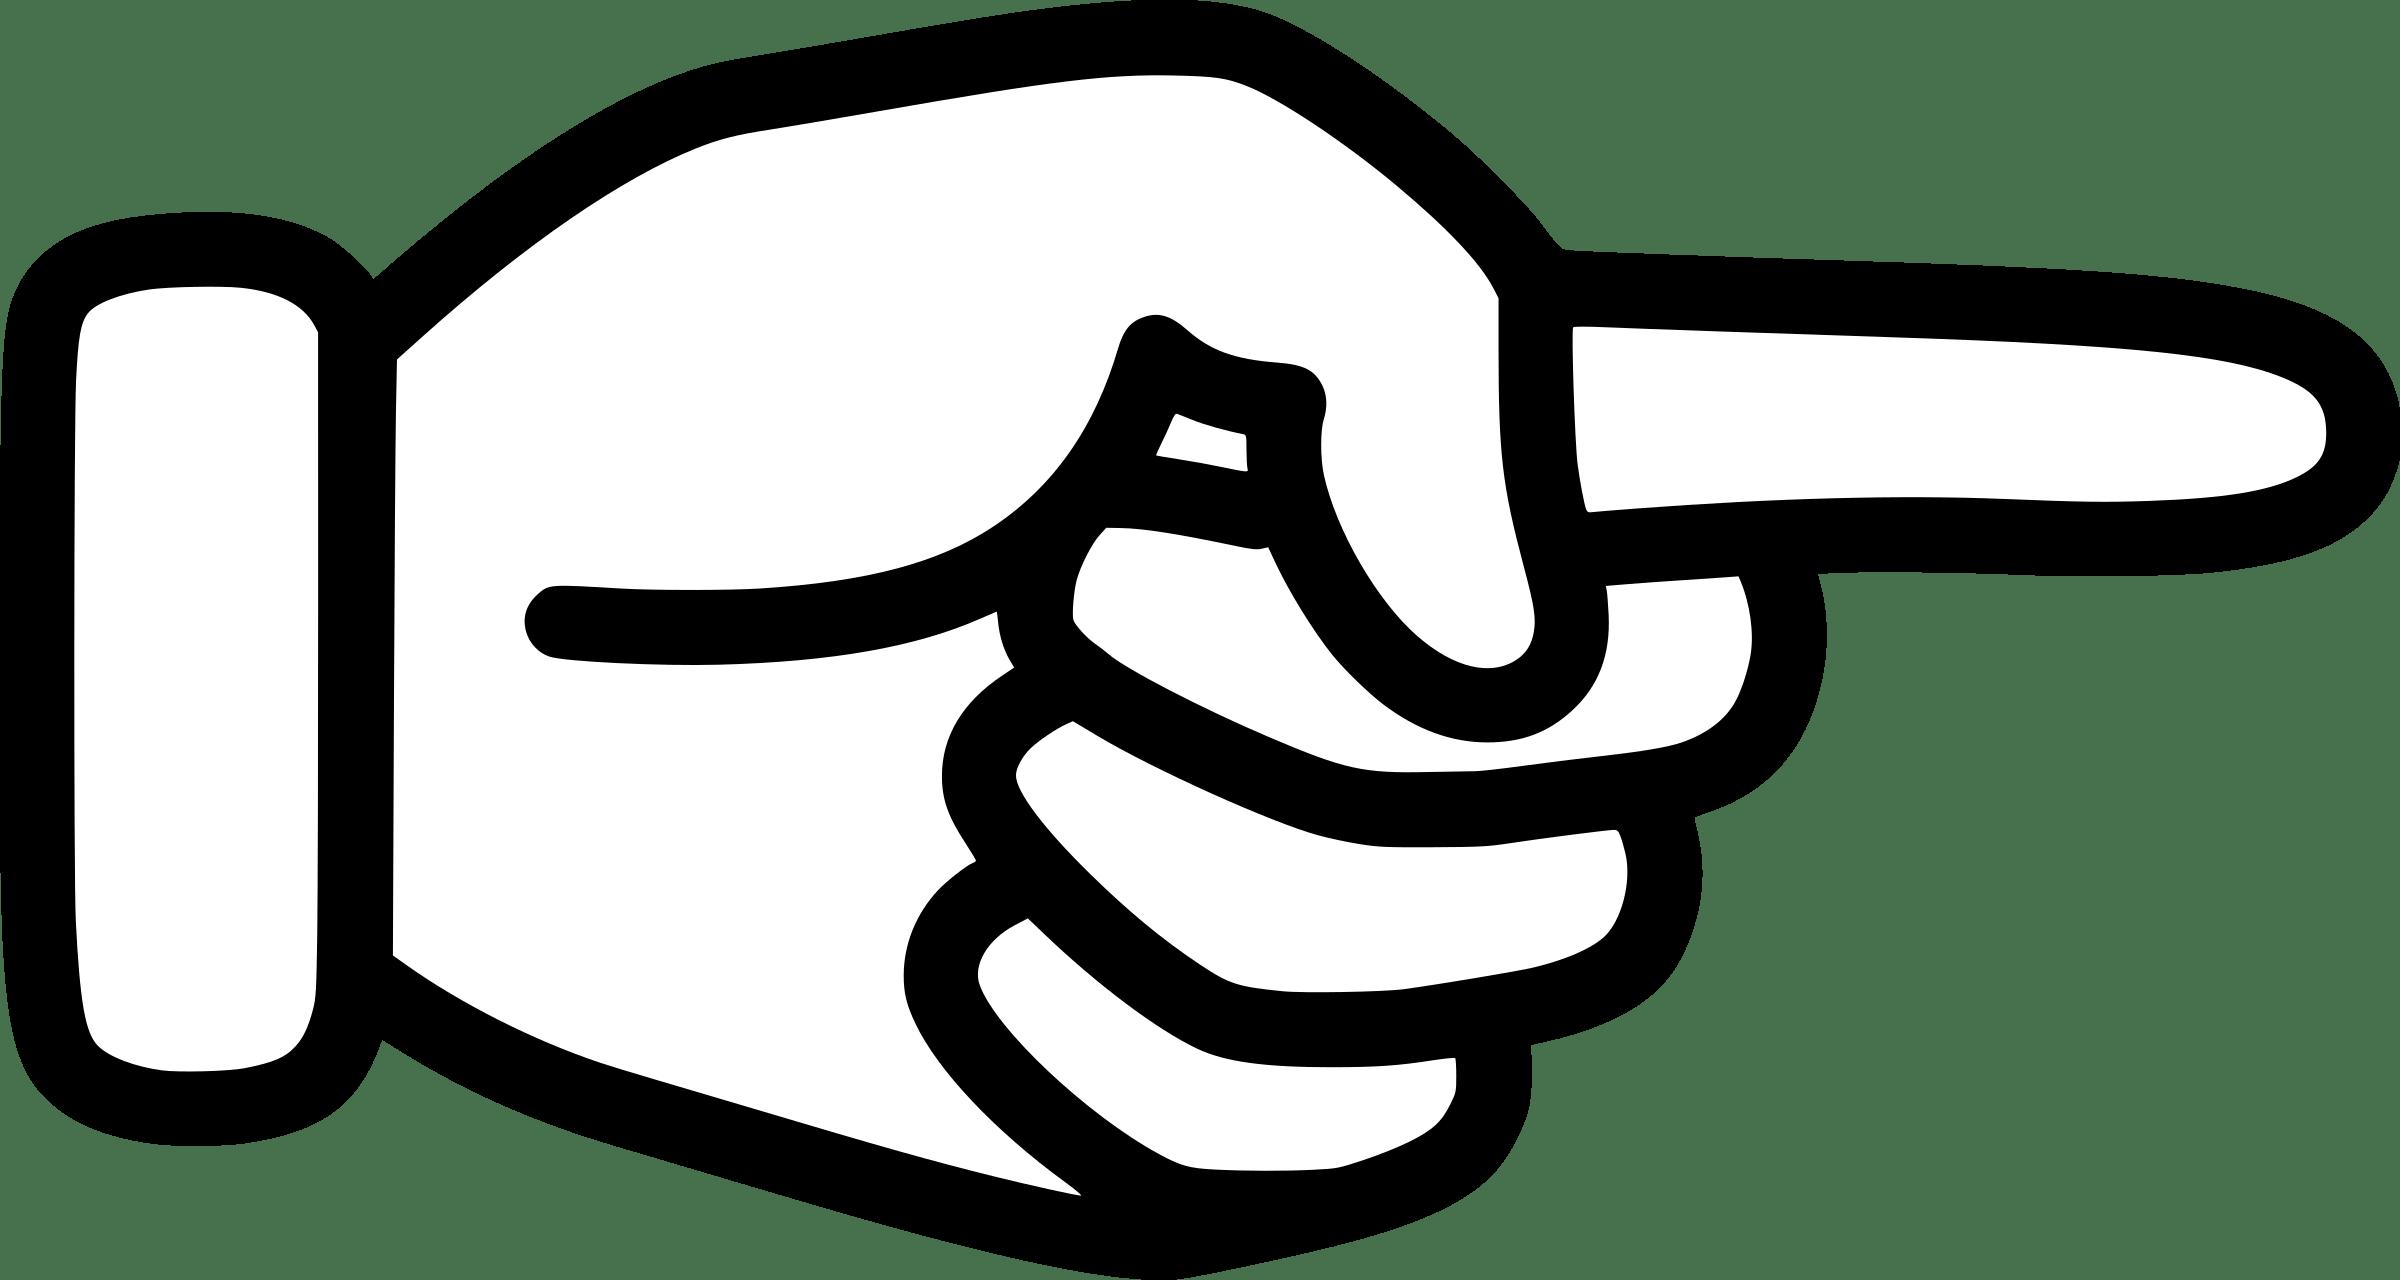 Finger point clipart 5 » Clipart Portal.